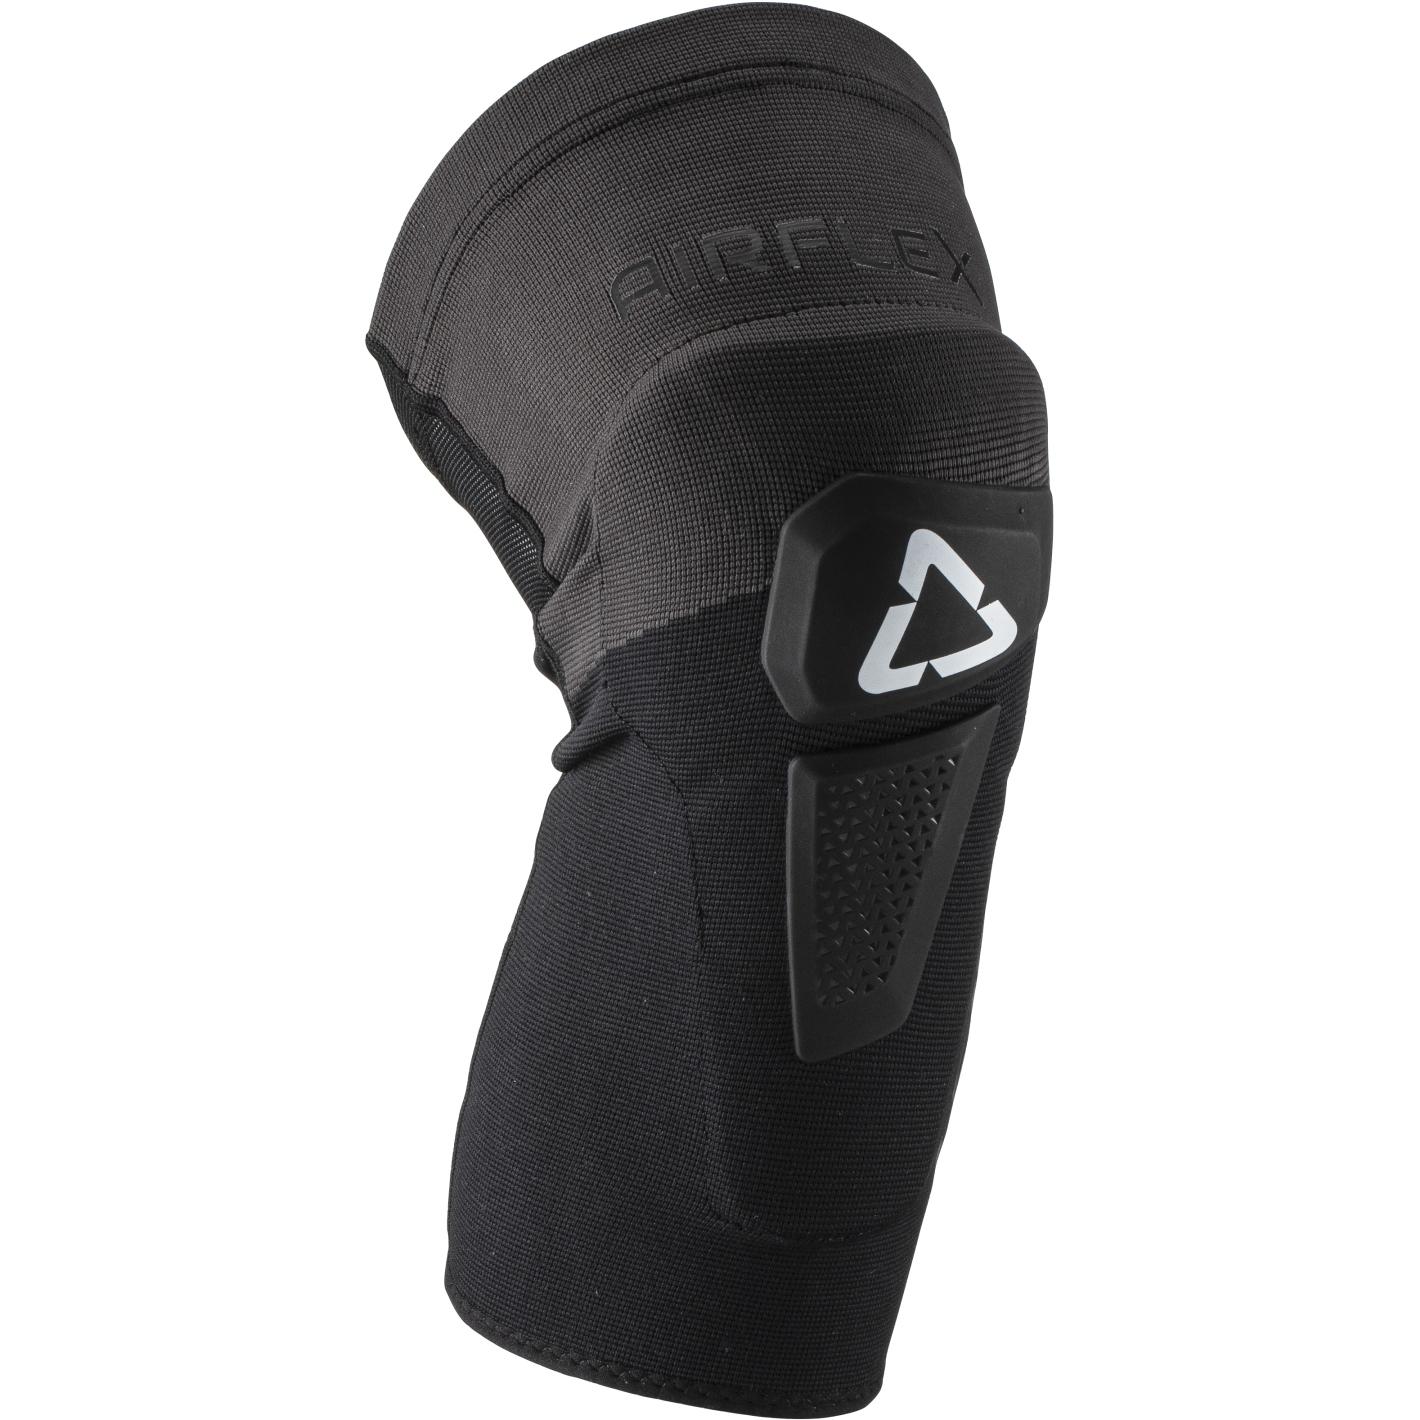 Leatt Knee Guard AirFlex Hybrid Knieprotektor - black